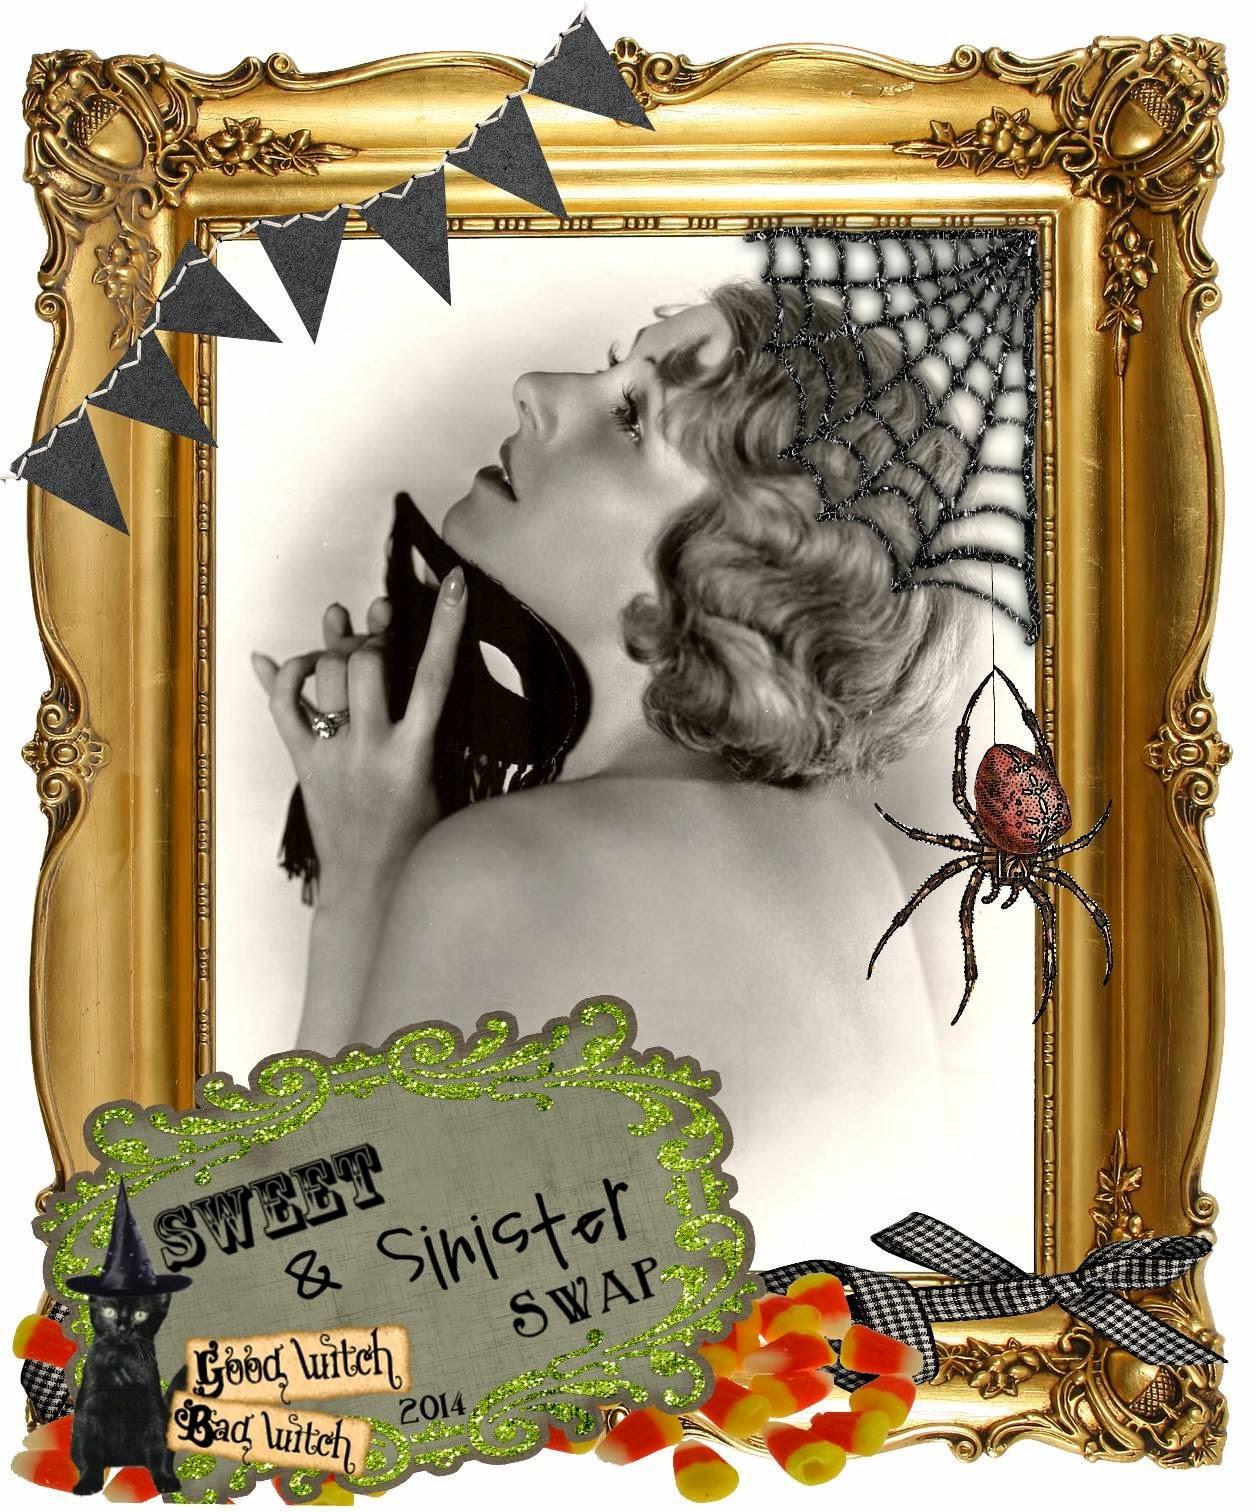 Sweet & Sinister Swap 2014